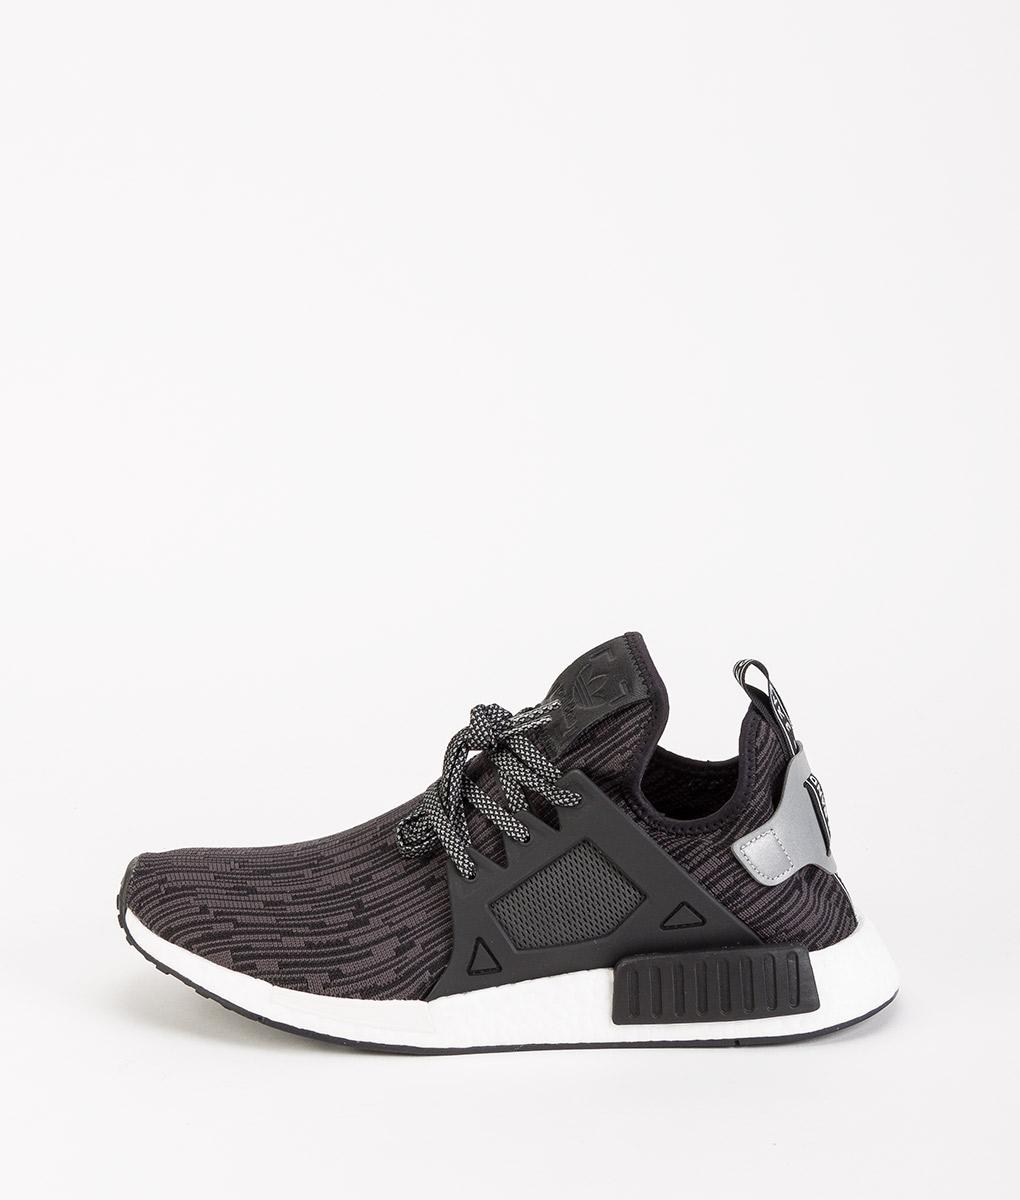 ADIDAS Men Running Shoes NMD XR1, Black Silver 159.99 1 – T68